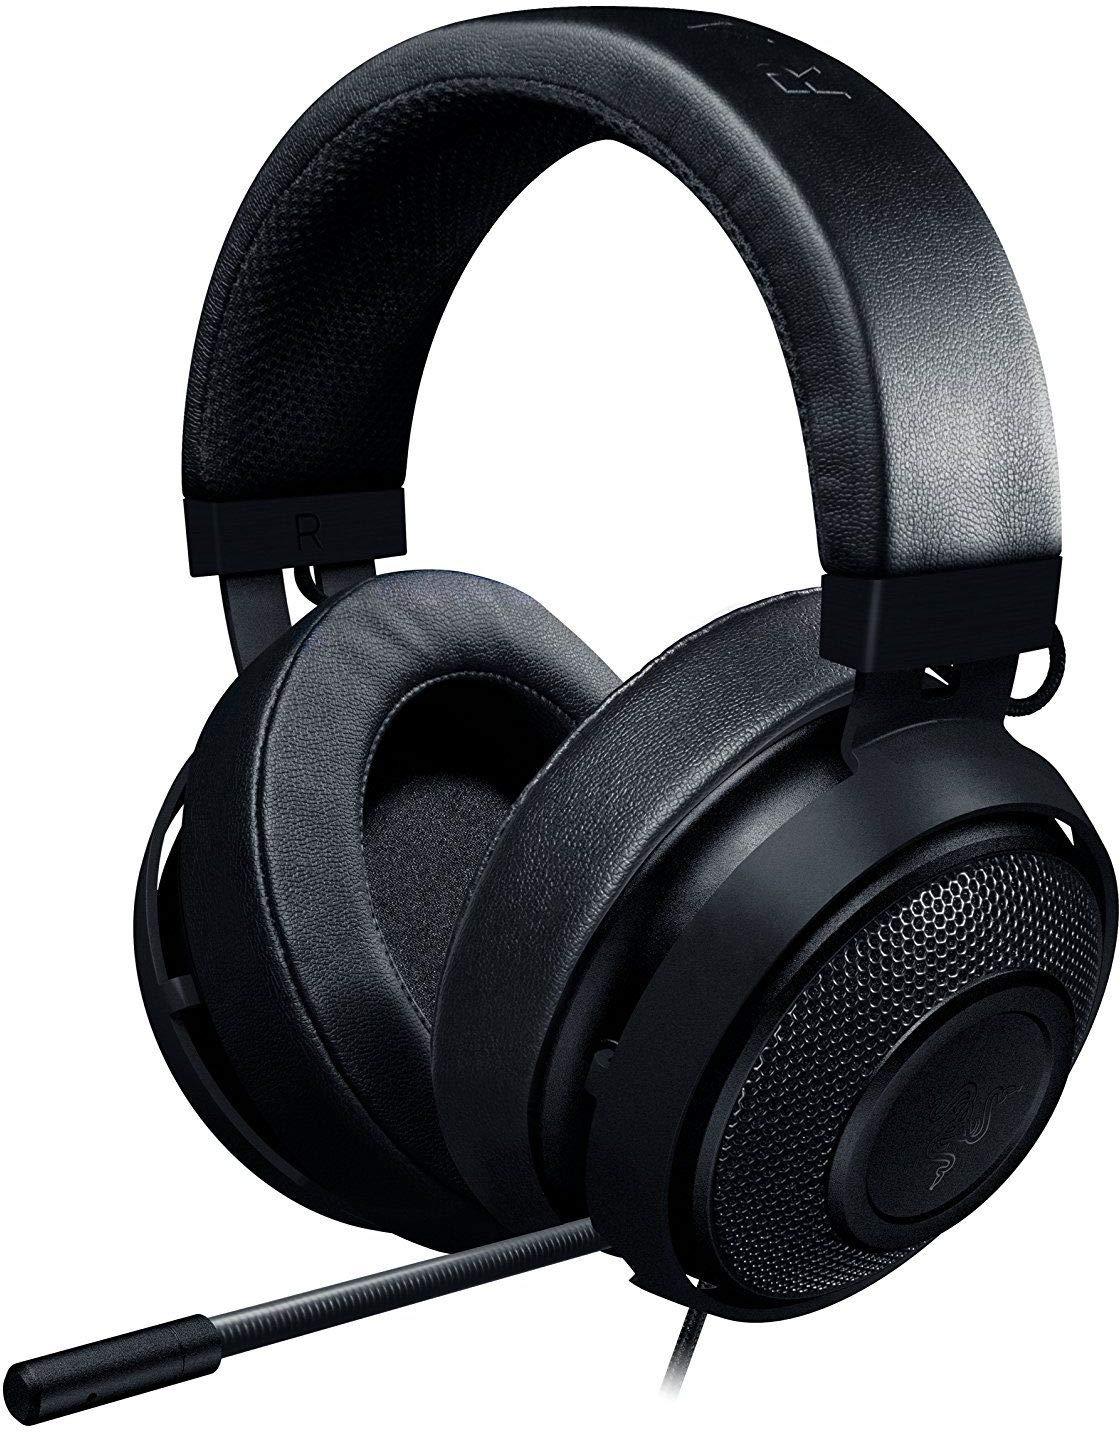 Razer Kraken Pro V2 Oval - Musik und Gaming: Amazon.de: Computer ...